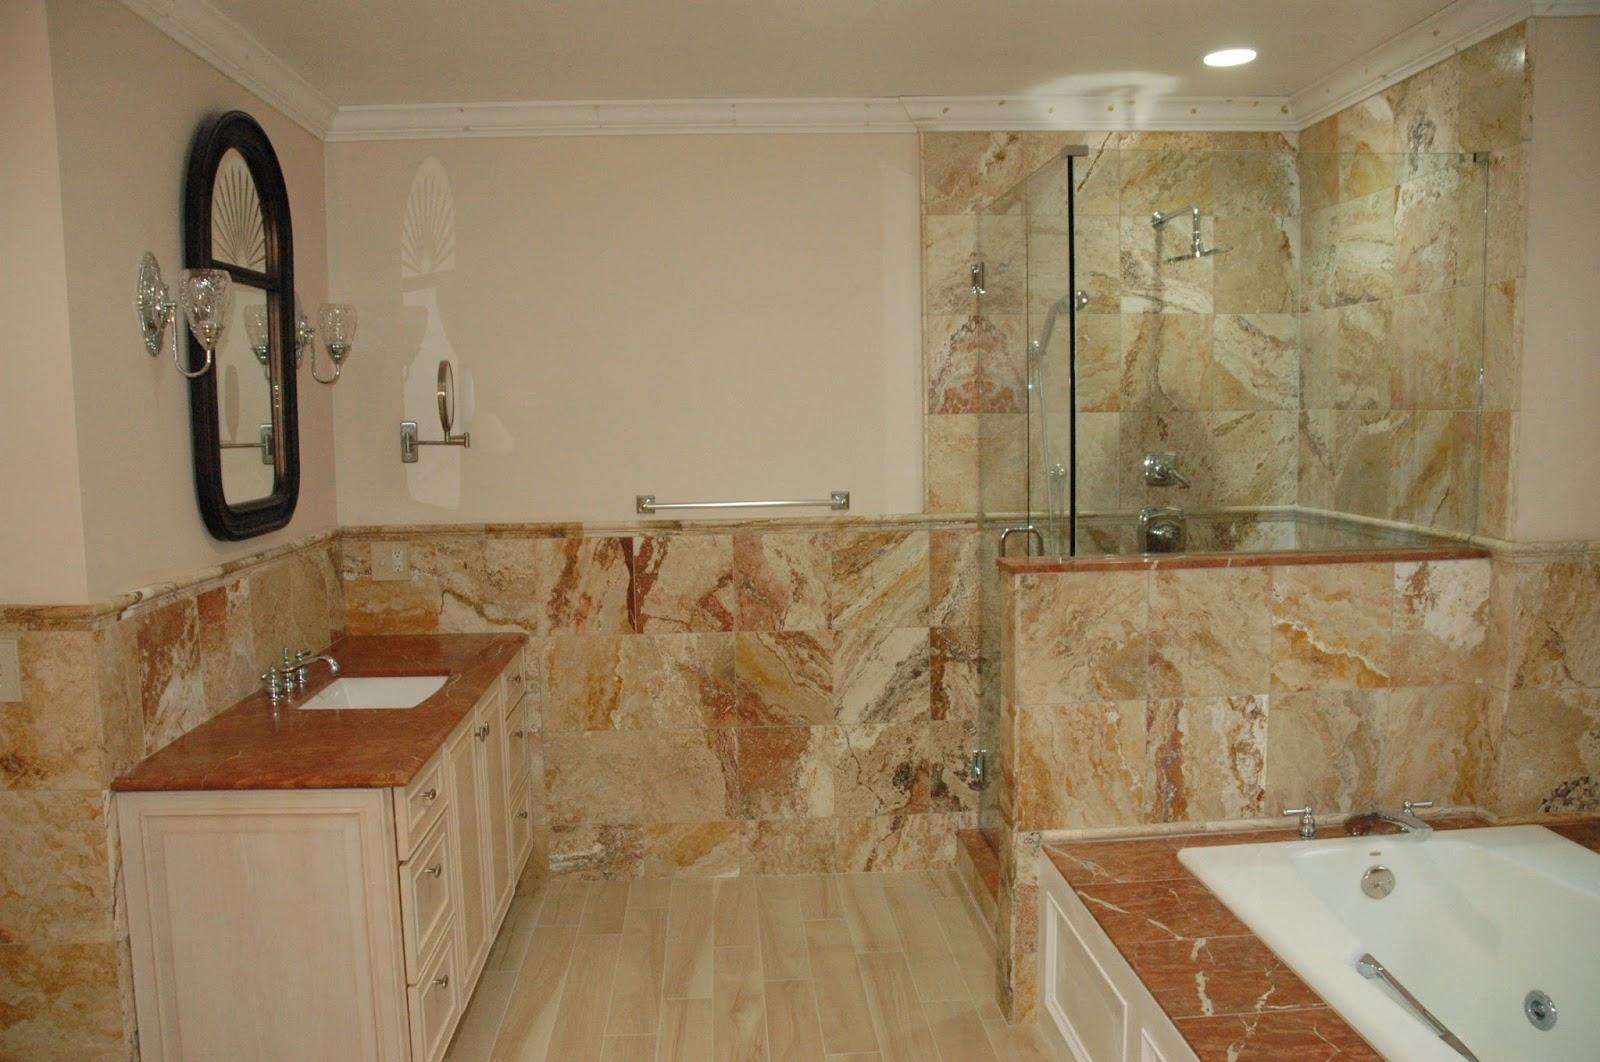 Custom Bathroom Remodeling 12x12 Travertinetile Installation For Master Bathroom Shower Walls